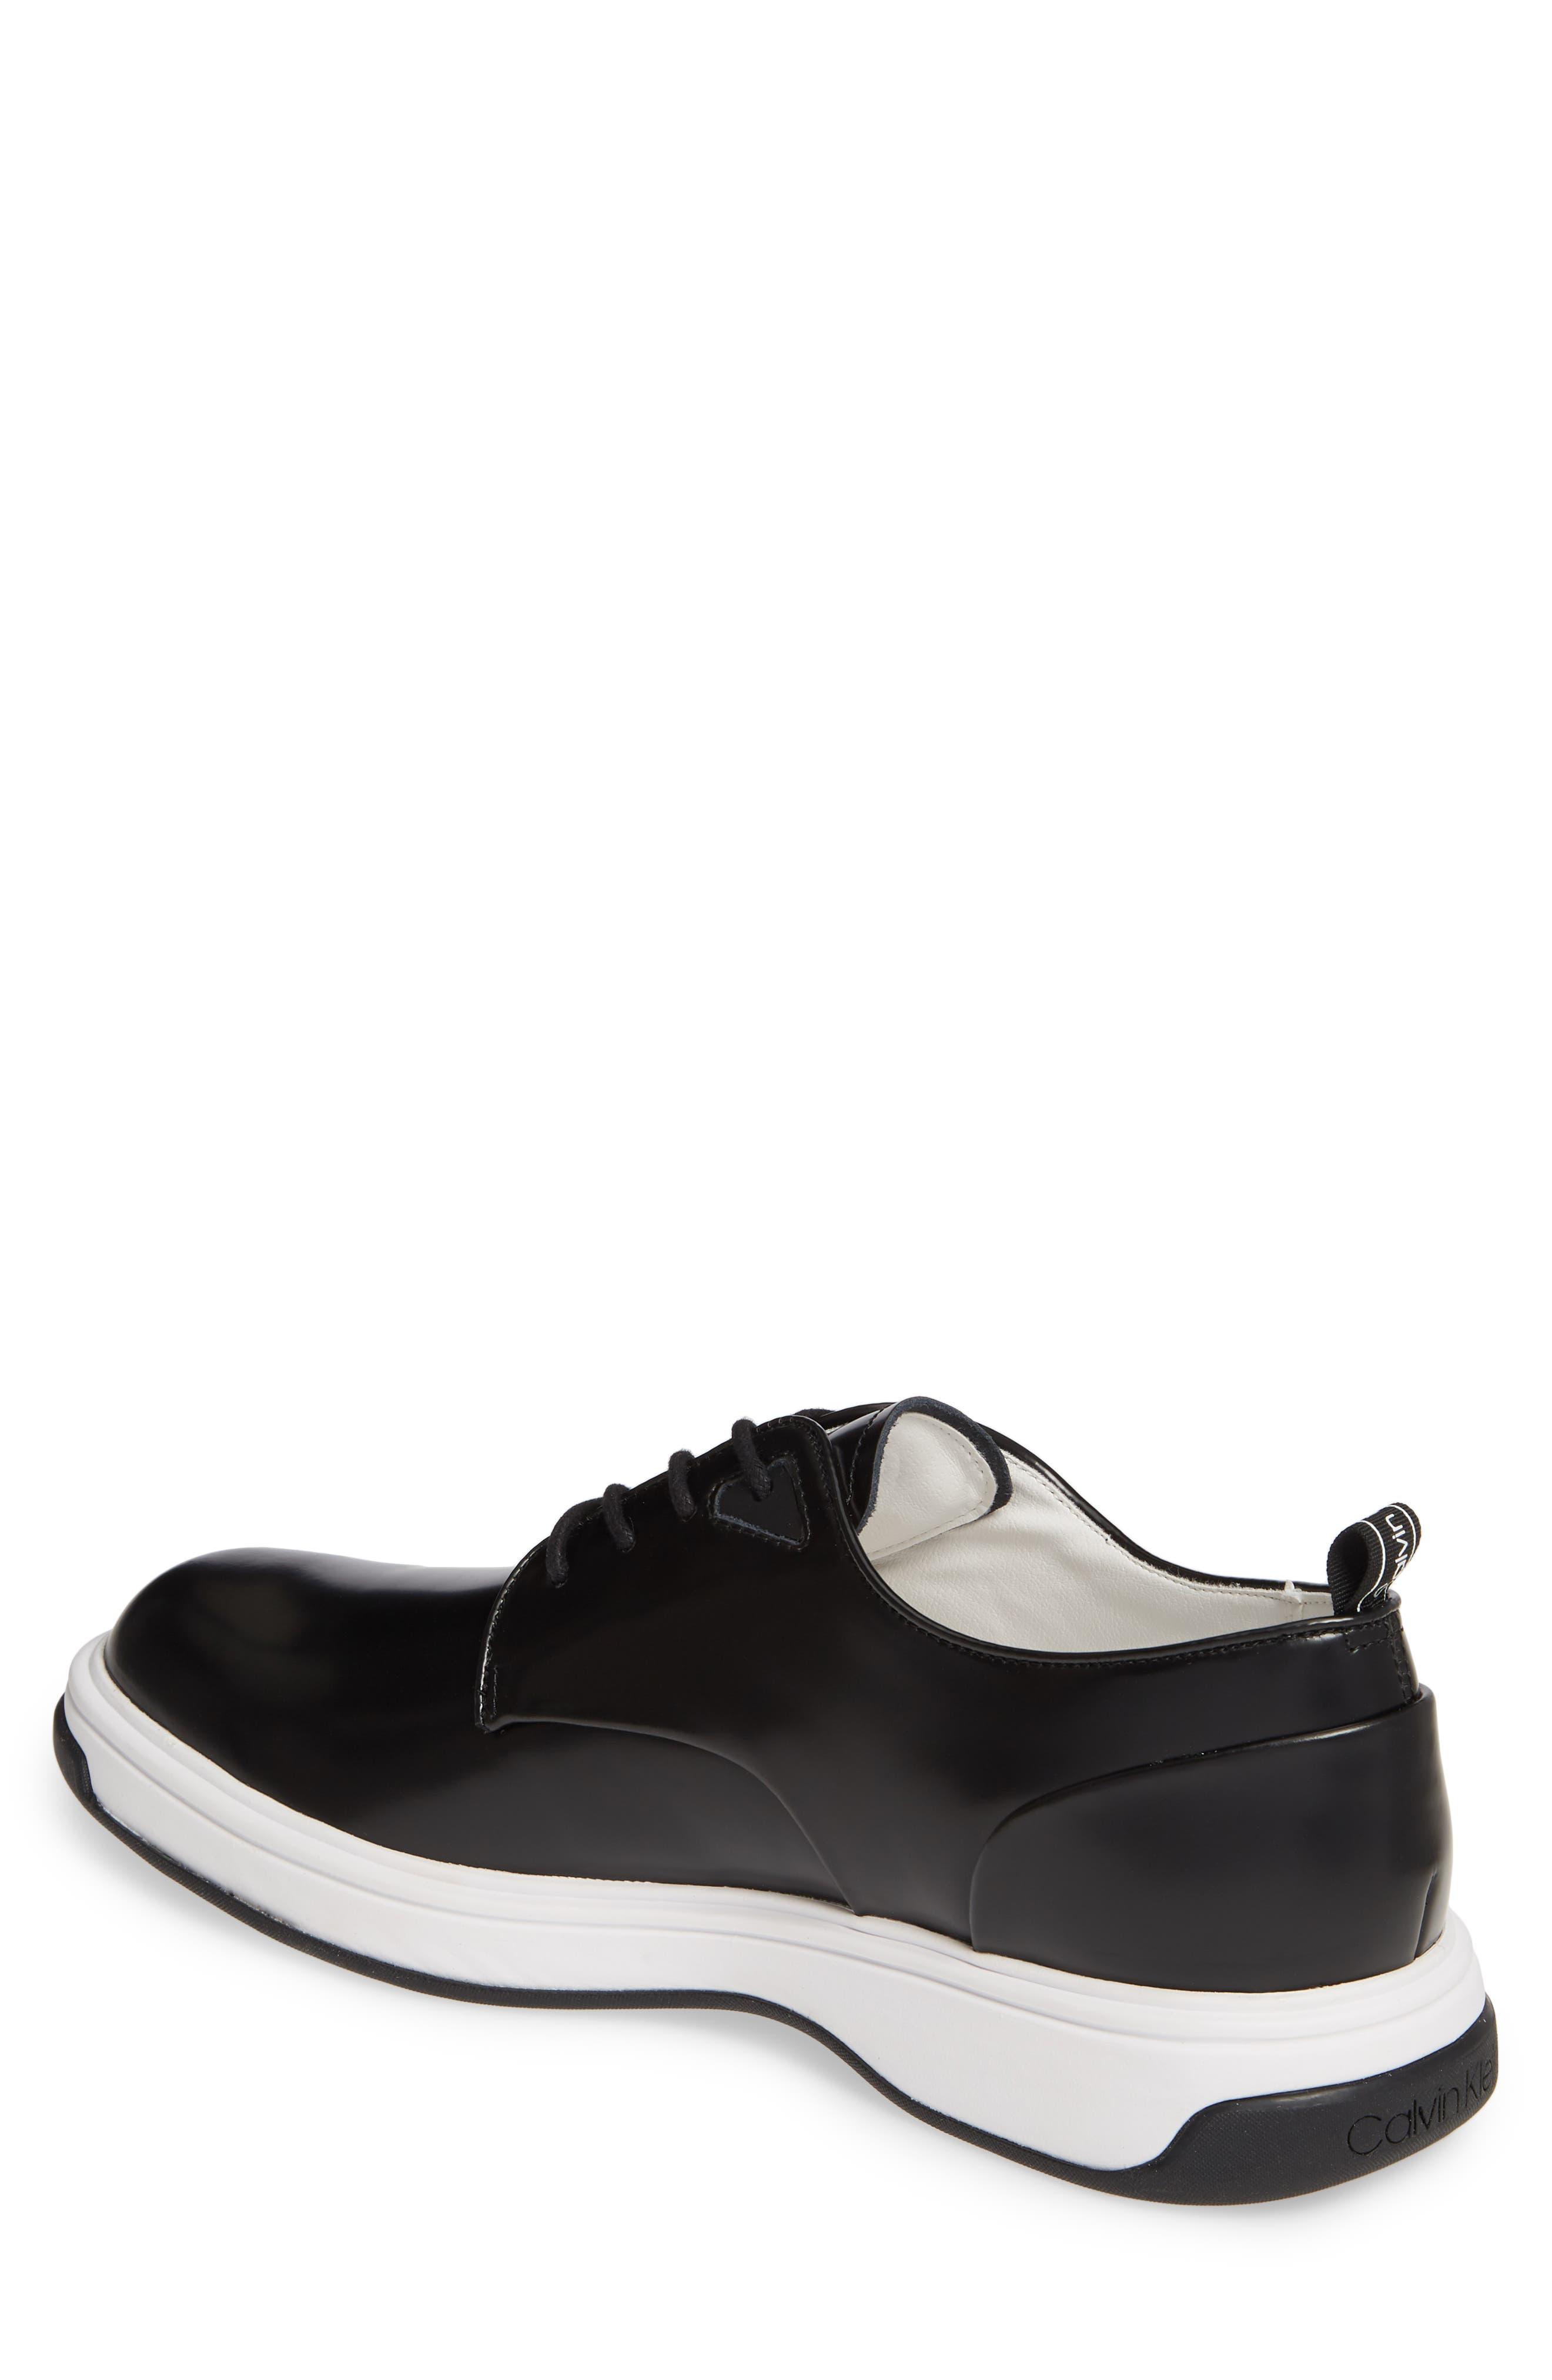 CALVIN KLEIN, Patsy Sneaker, Alternate thumbnail 2, color, BLACK